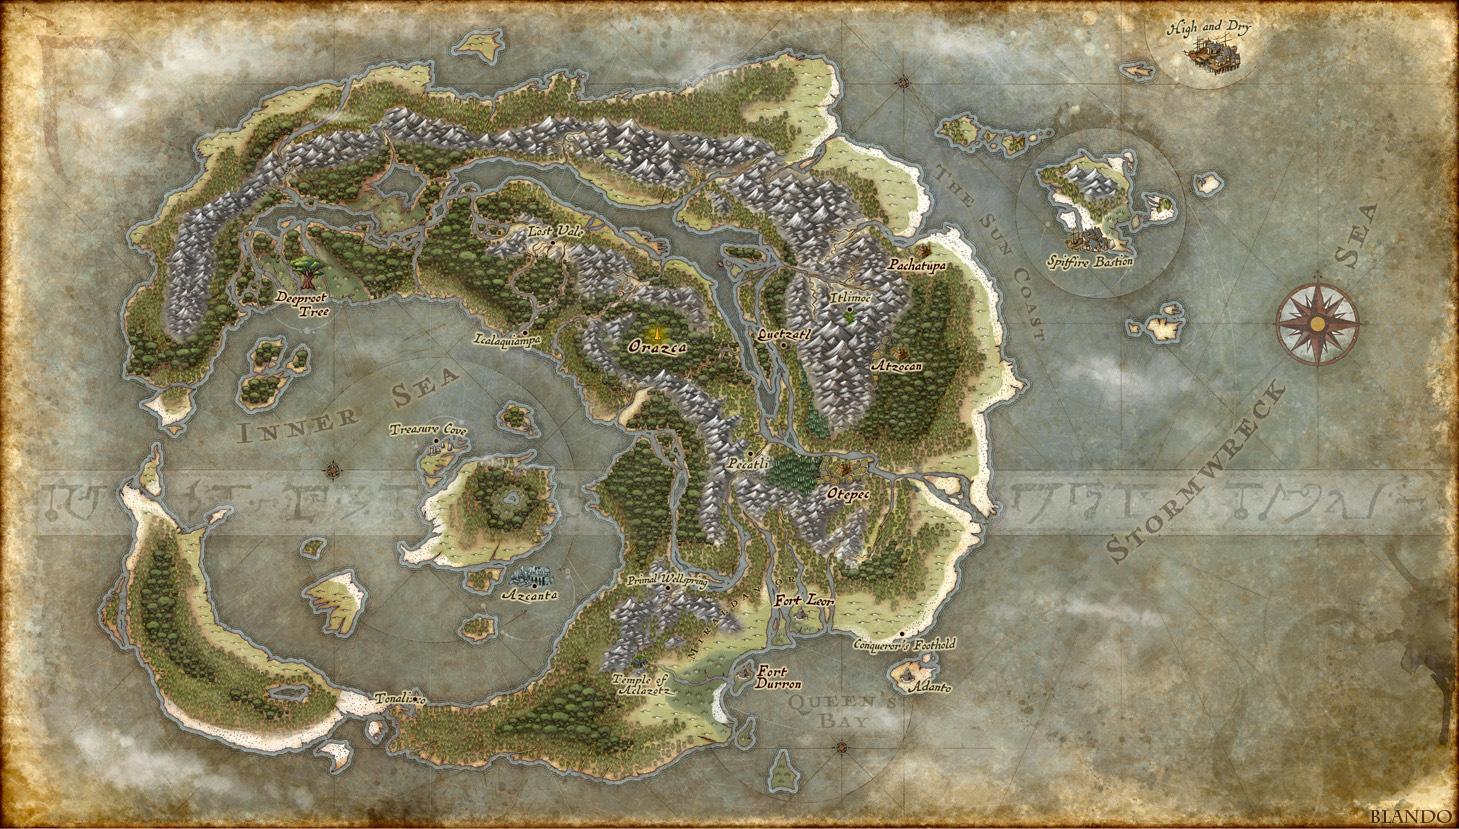 The Lands of Ixalan